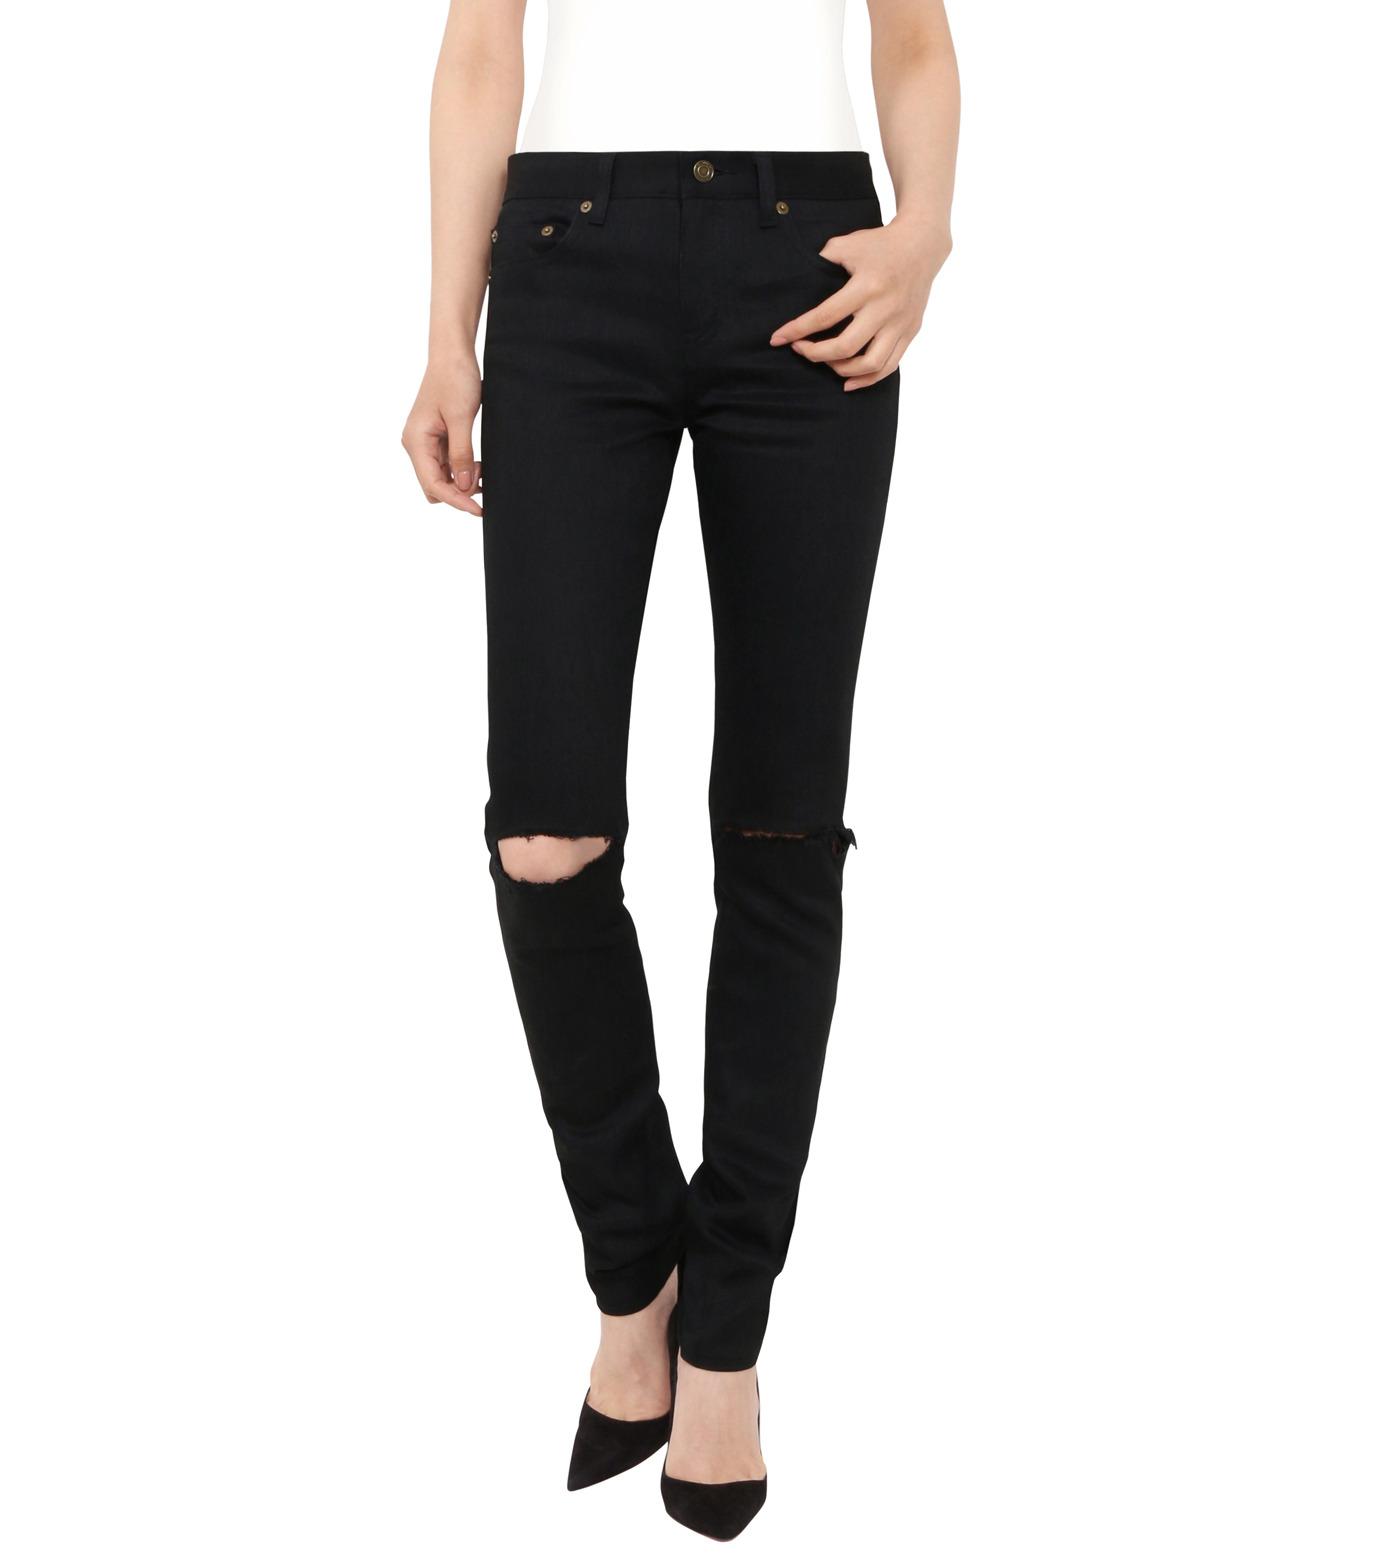 SAINT LAURENT(サンローラン)のskinny low waist knee holes-BLACK(デニム/denim)-398184-Y471K-13 拡大詳細画像1